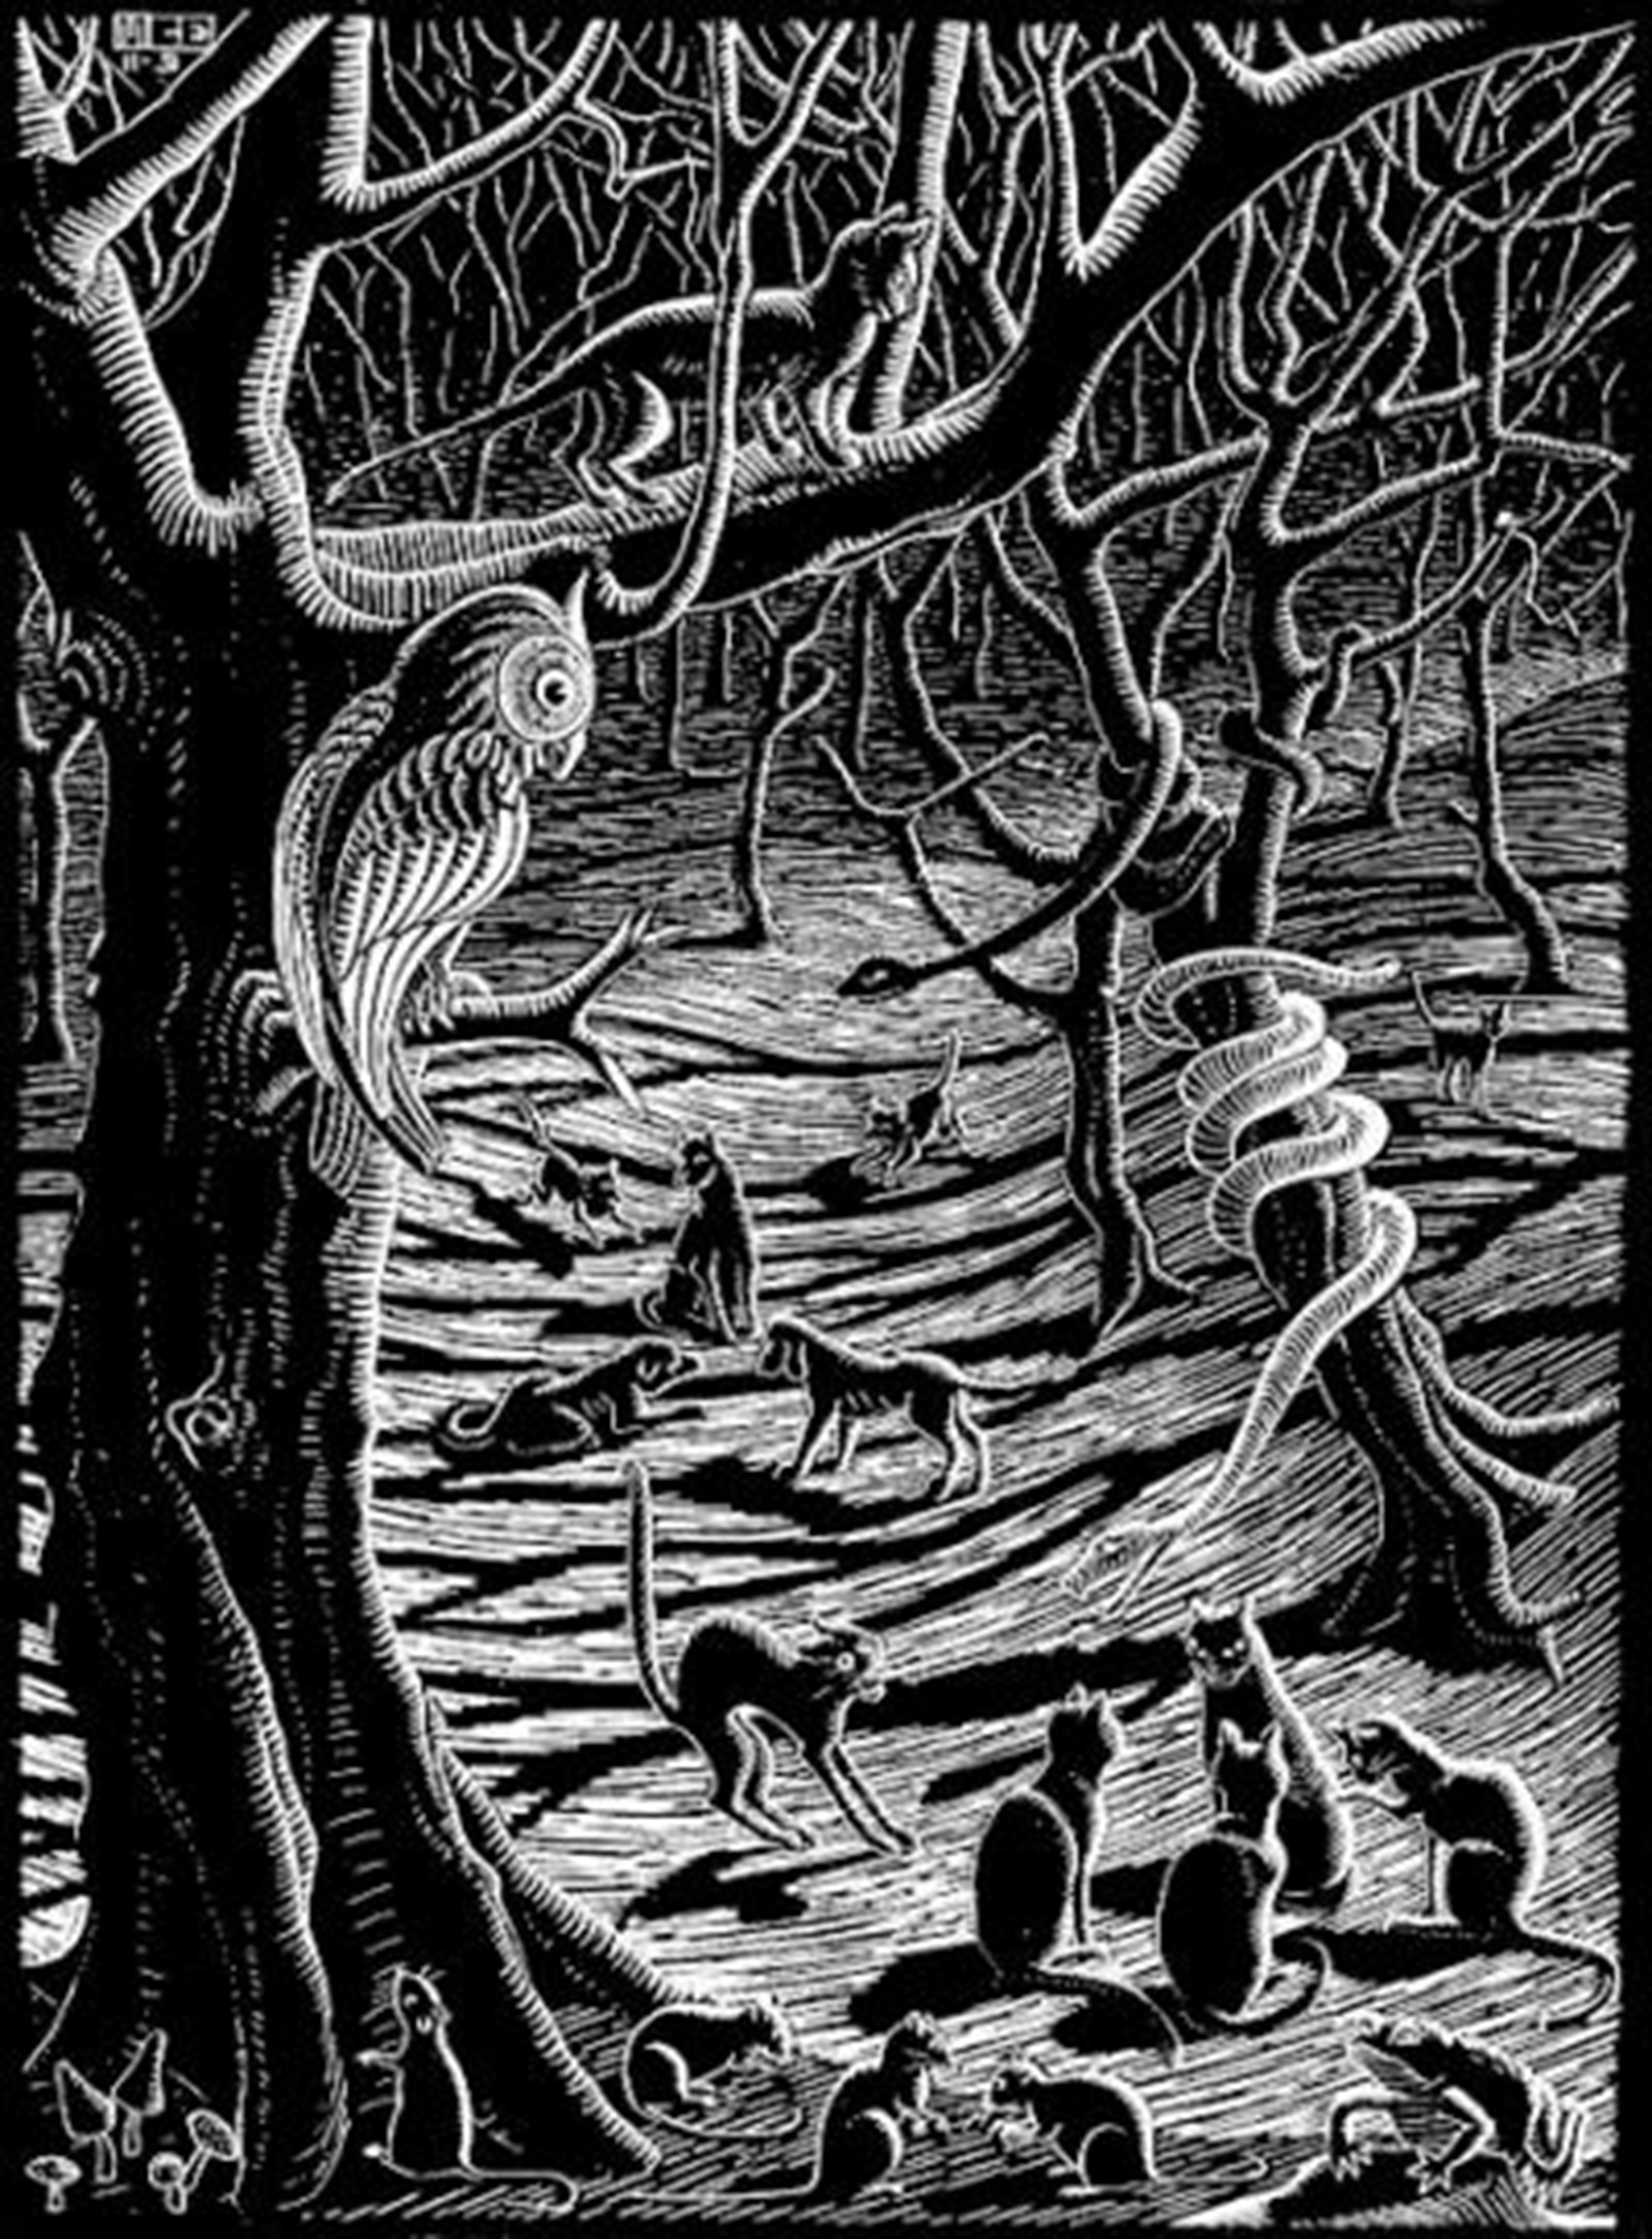 Scholastica (Full Moon) by M.C. Escher